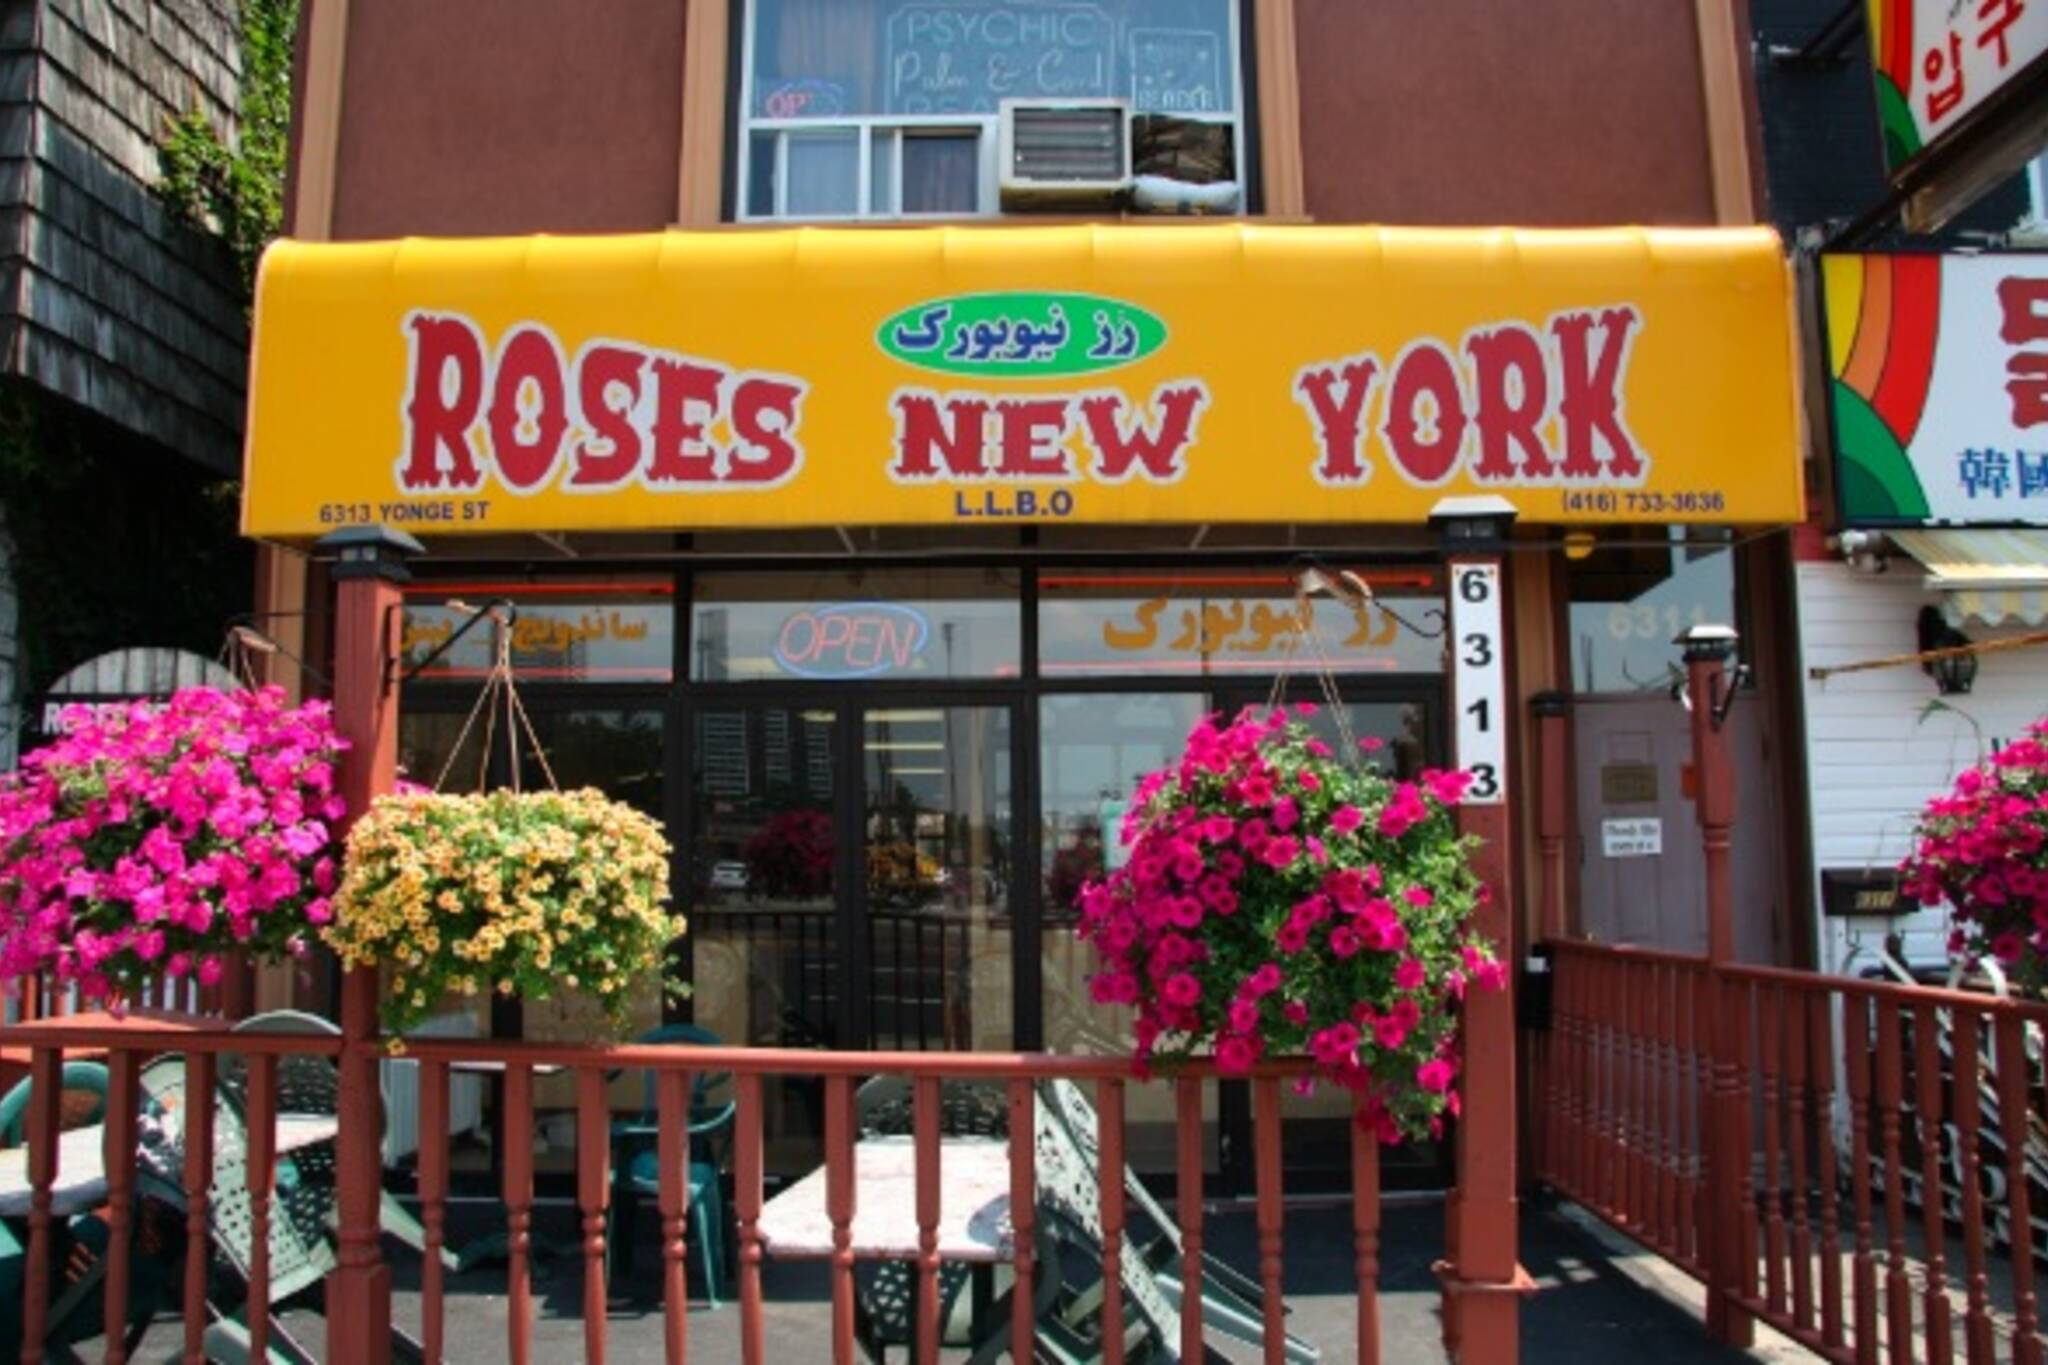 Toronto Rose's New York